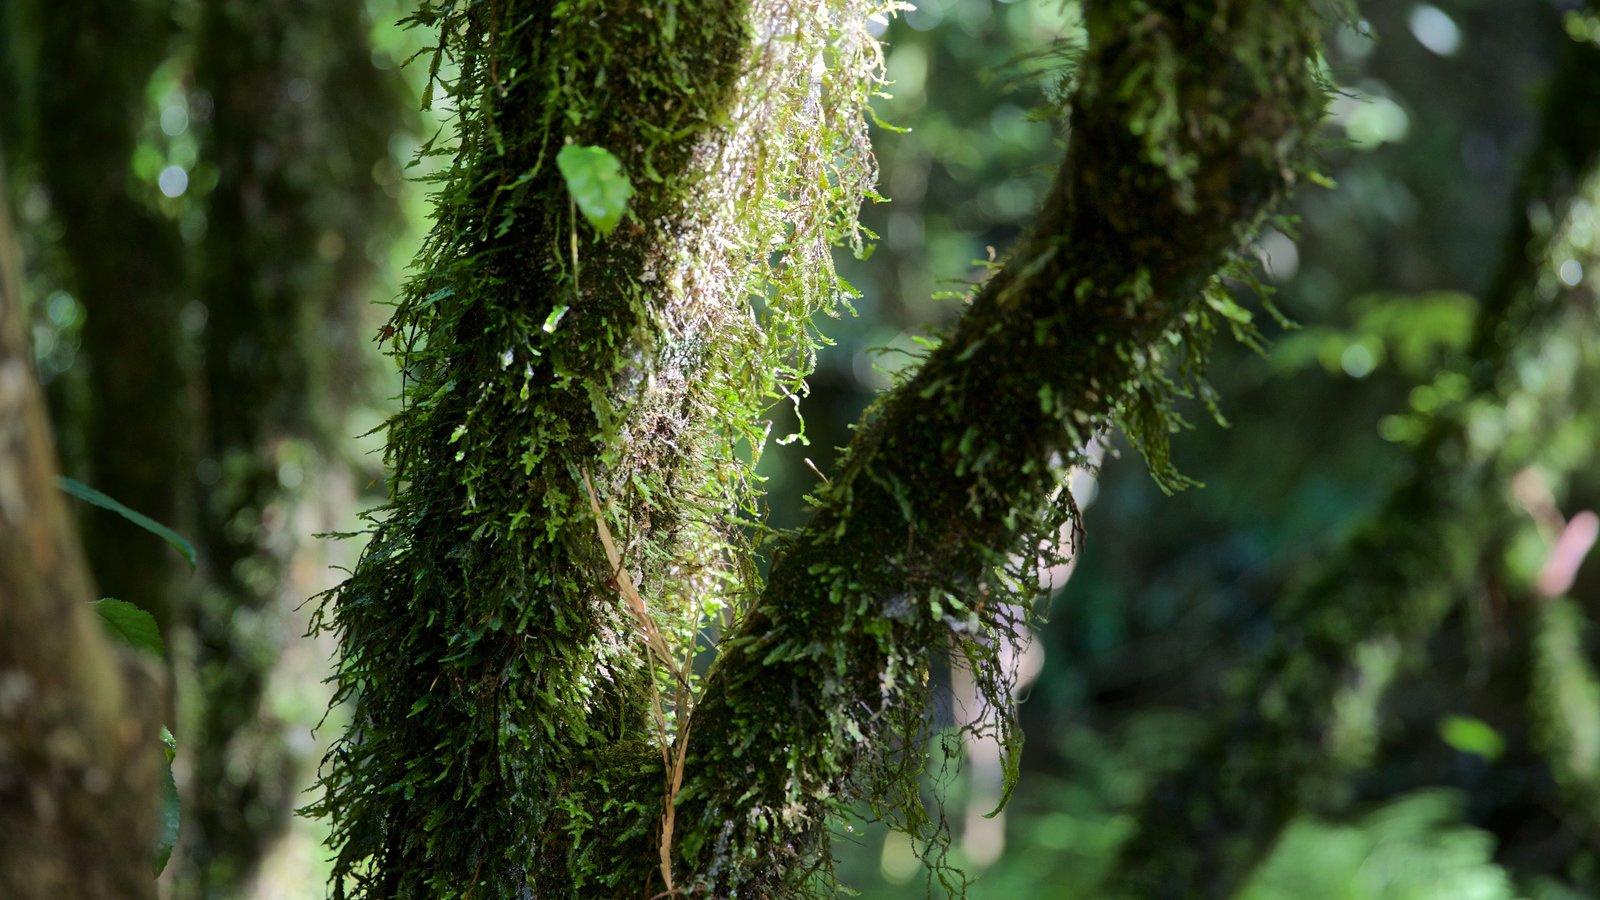 Waitomo Glowworm Caves mostrando cenas de floresta